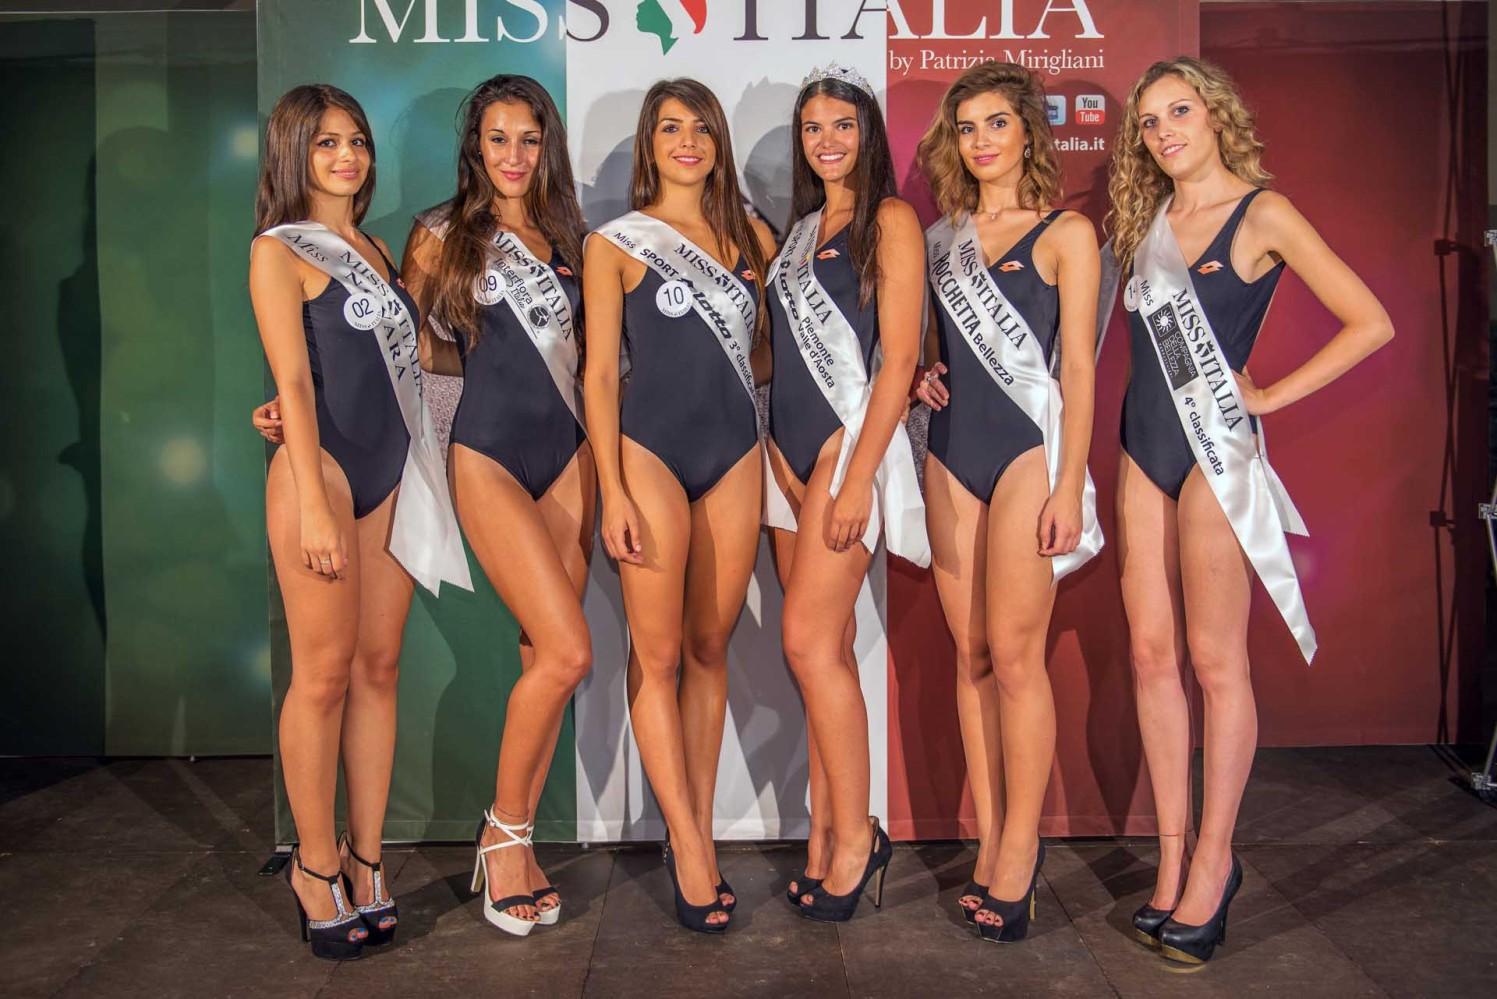 Francesca Sabbatino, Federica Seglie, Arianna Amodeo, Giulia Cordaro, Elisa Muriale, Erika Ambesi  (2)